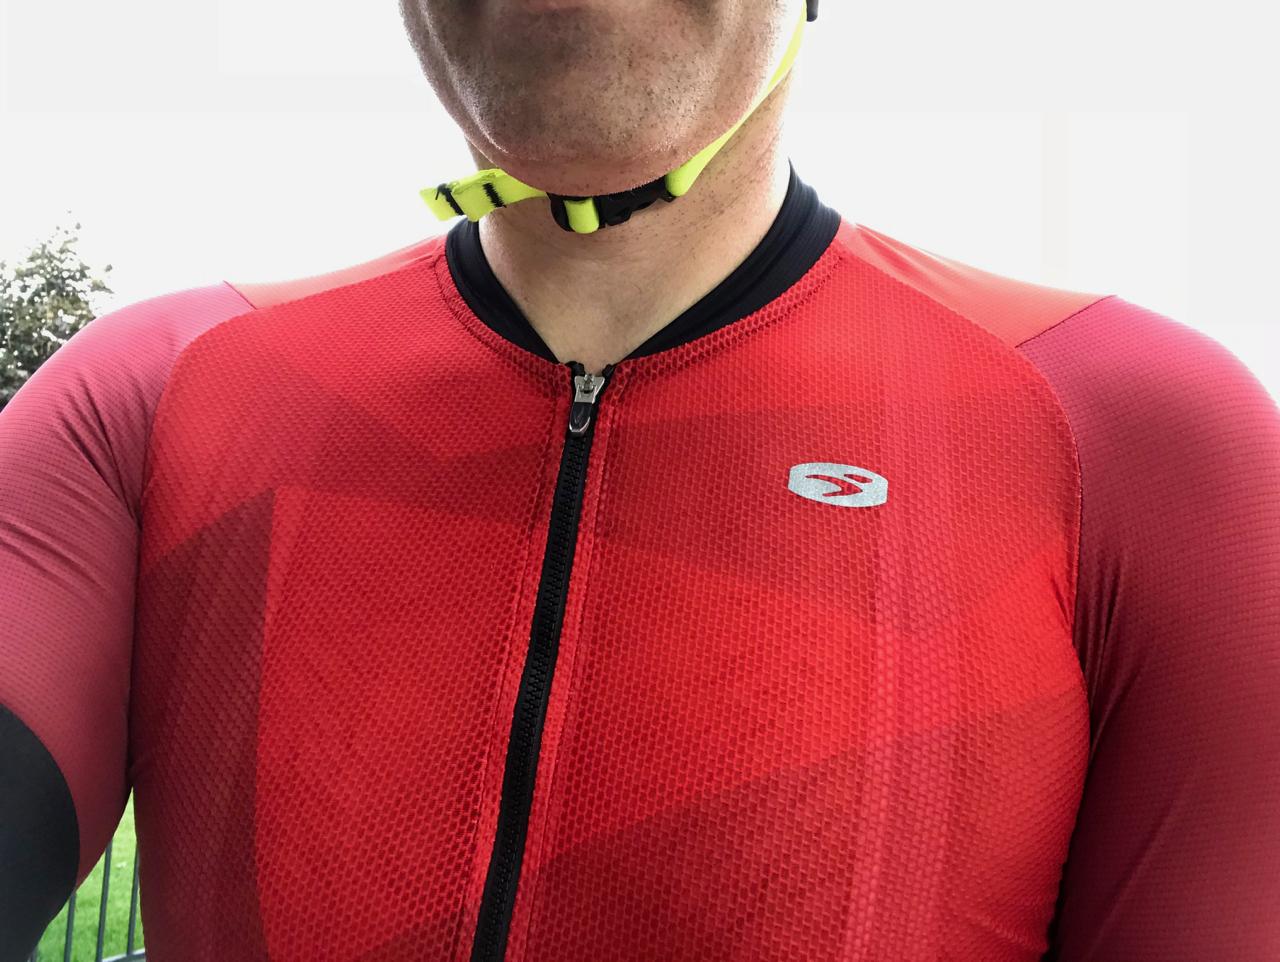 Sugoi RS Pro Climber s Jersey Review - FeedTheHabit.com d5109ec98